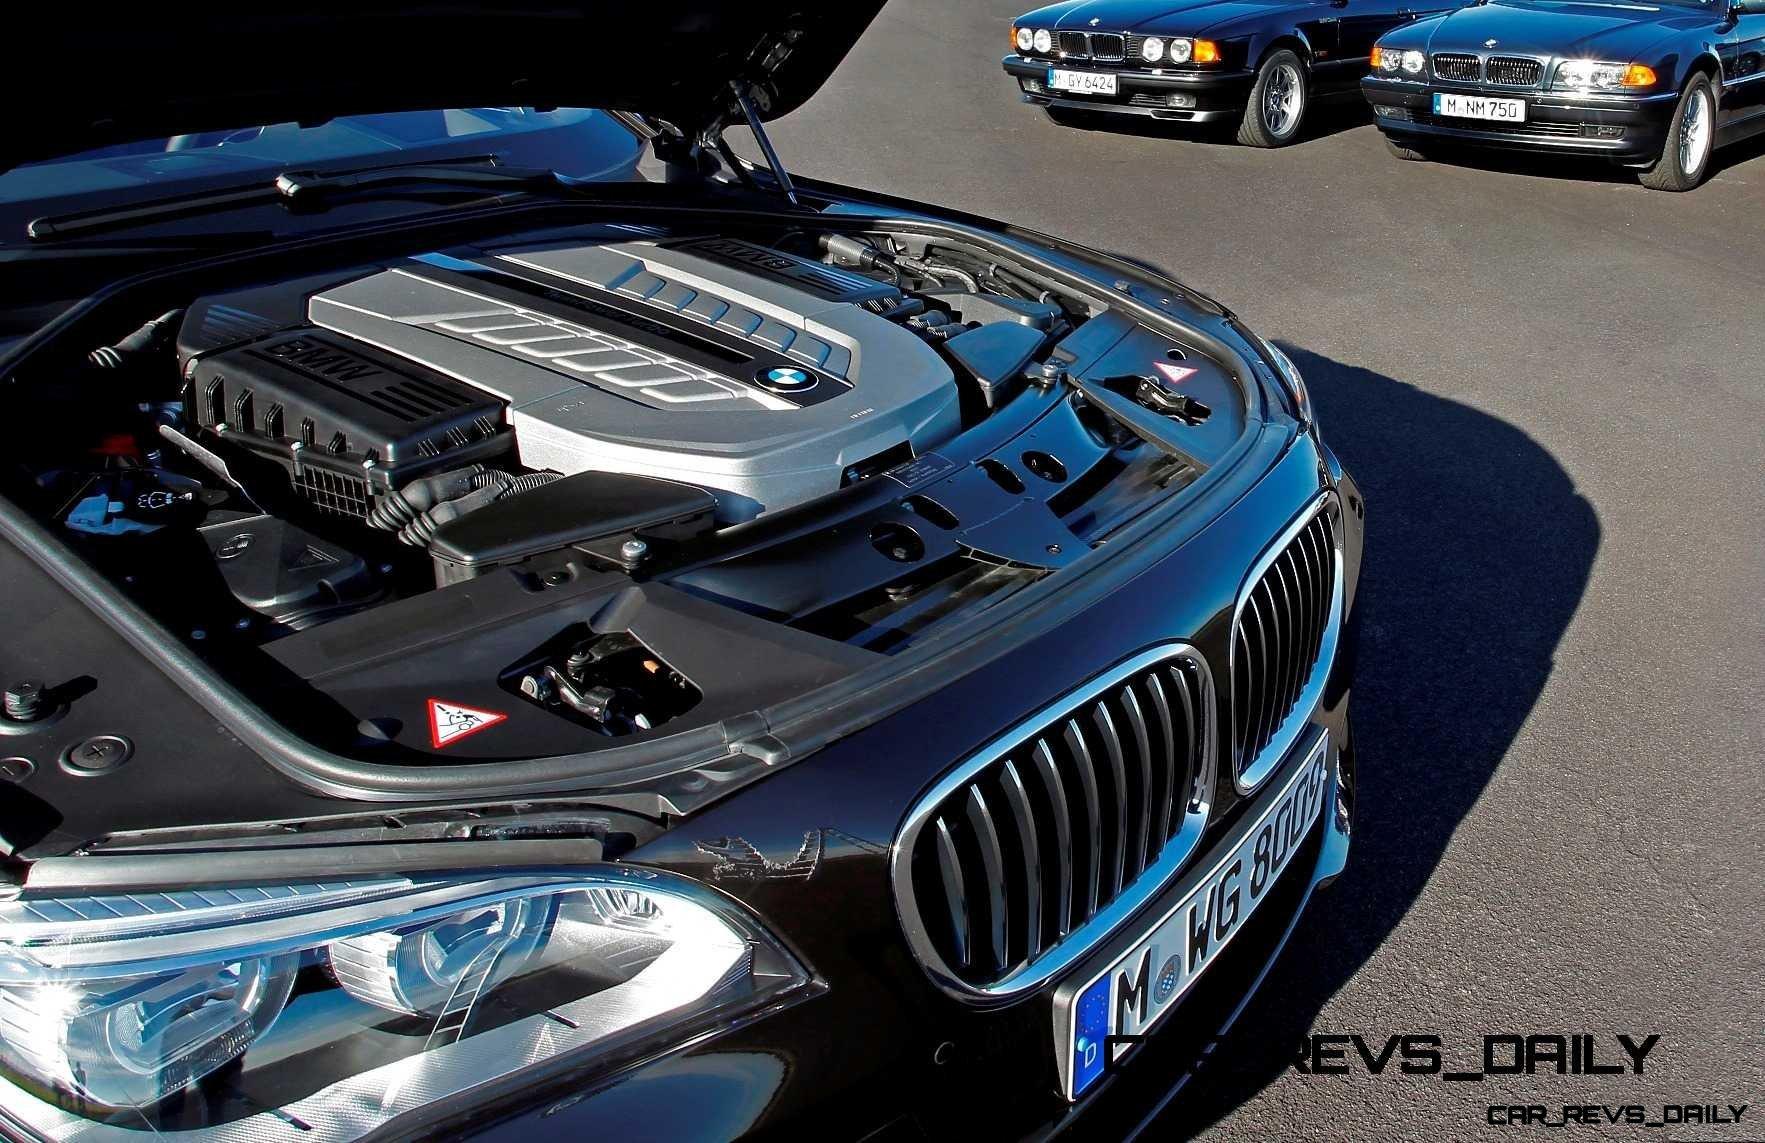 Celebrating-the-Evolution-of-the-V12-BMW-7-series